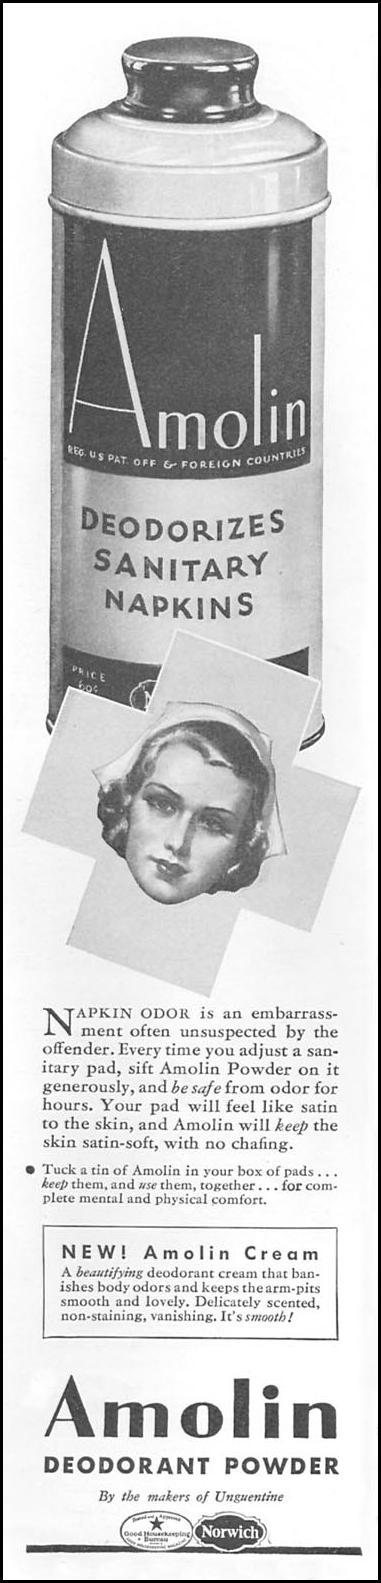 AMOLIN DEODORANT POWDER GOOD HOUSEKEEPING 06/01/1935 p. 136